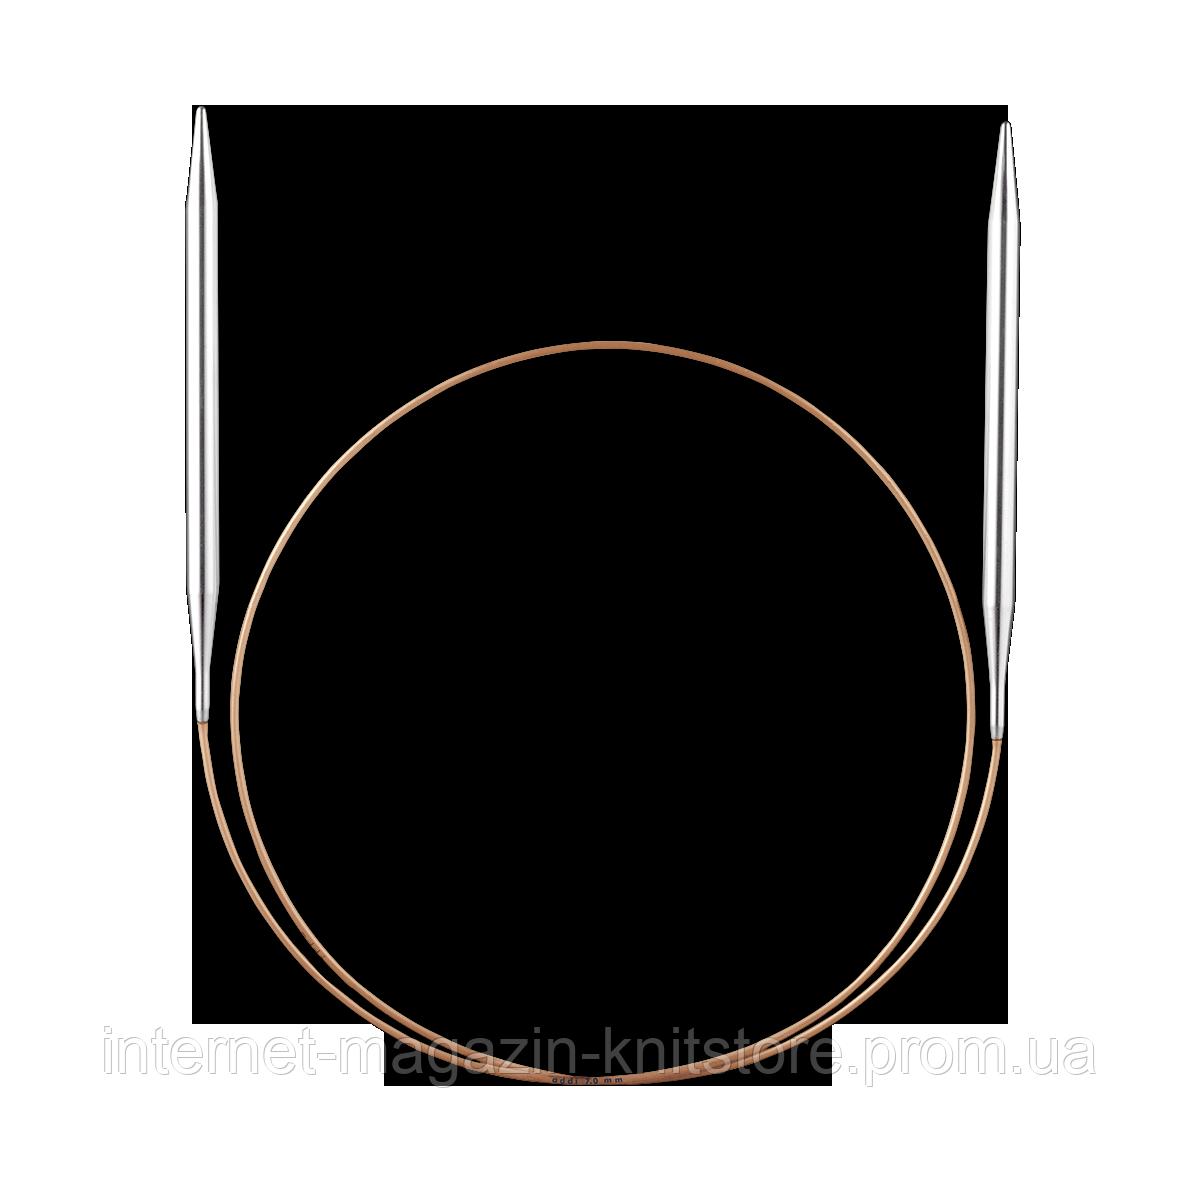 Спицы круговые Addi 100 см | 5 мм